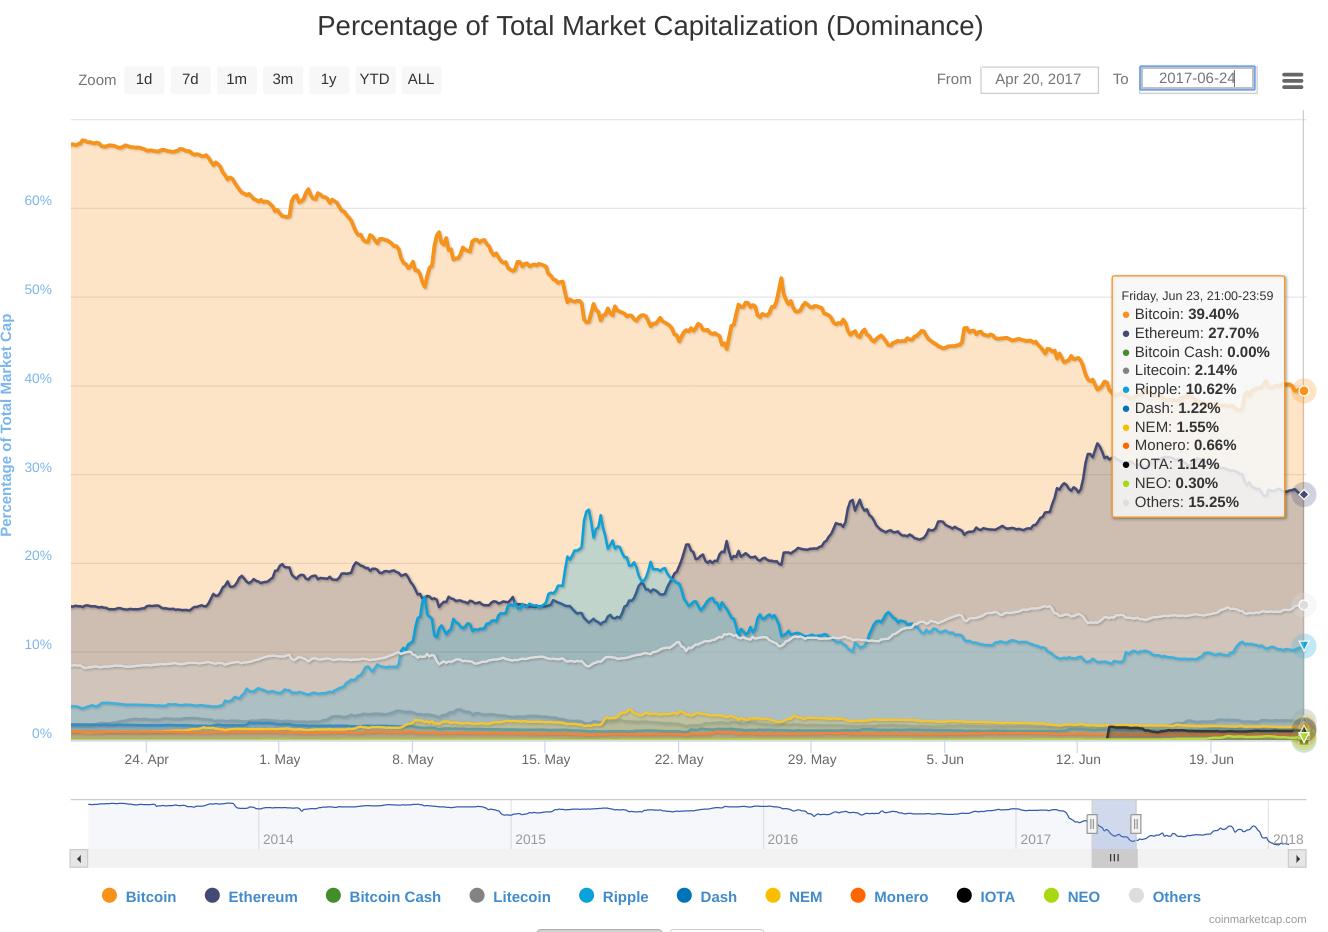 Bitcoin loses dominance